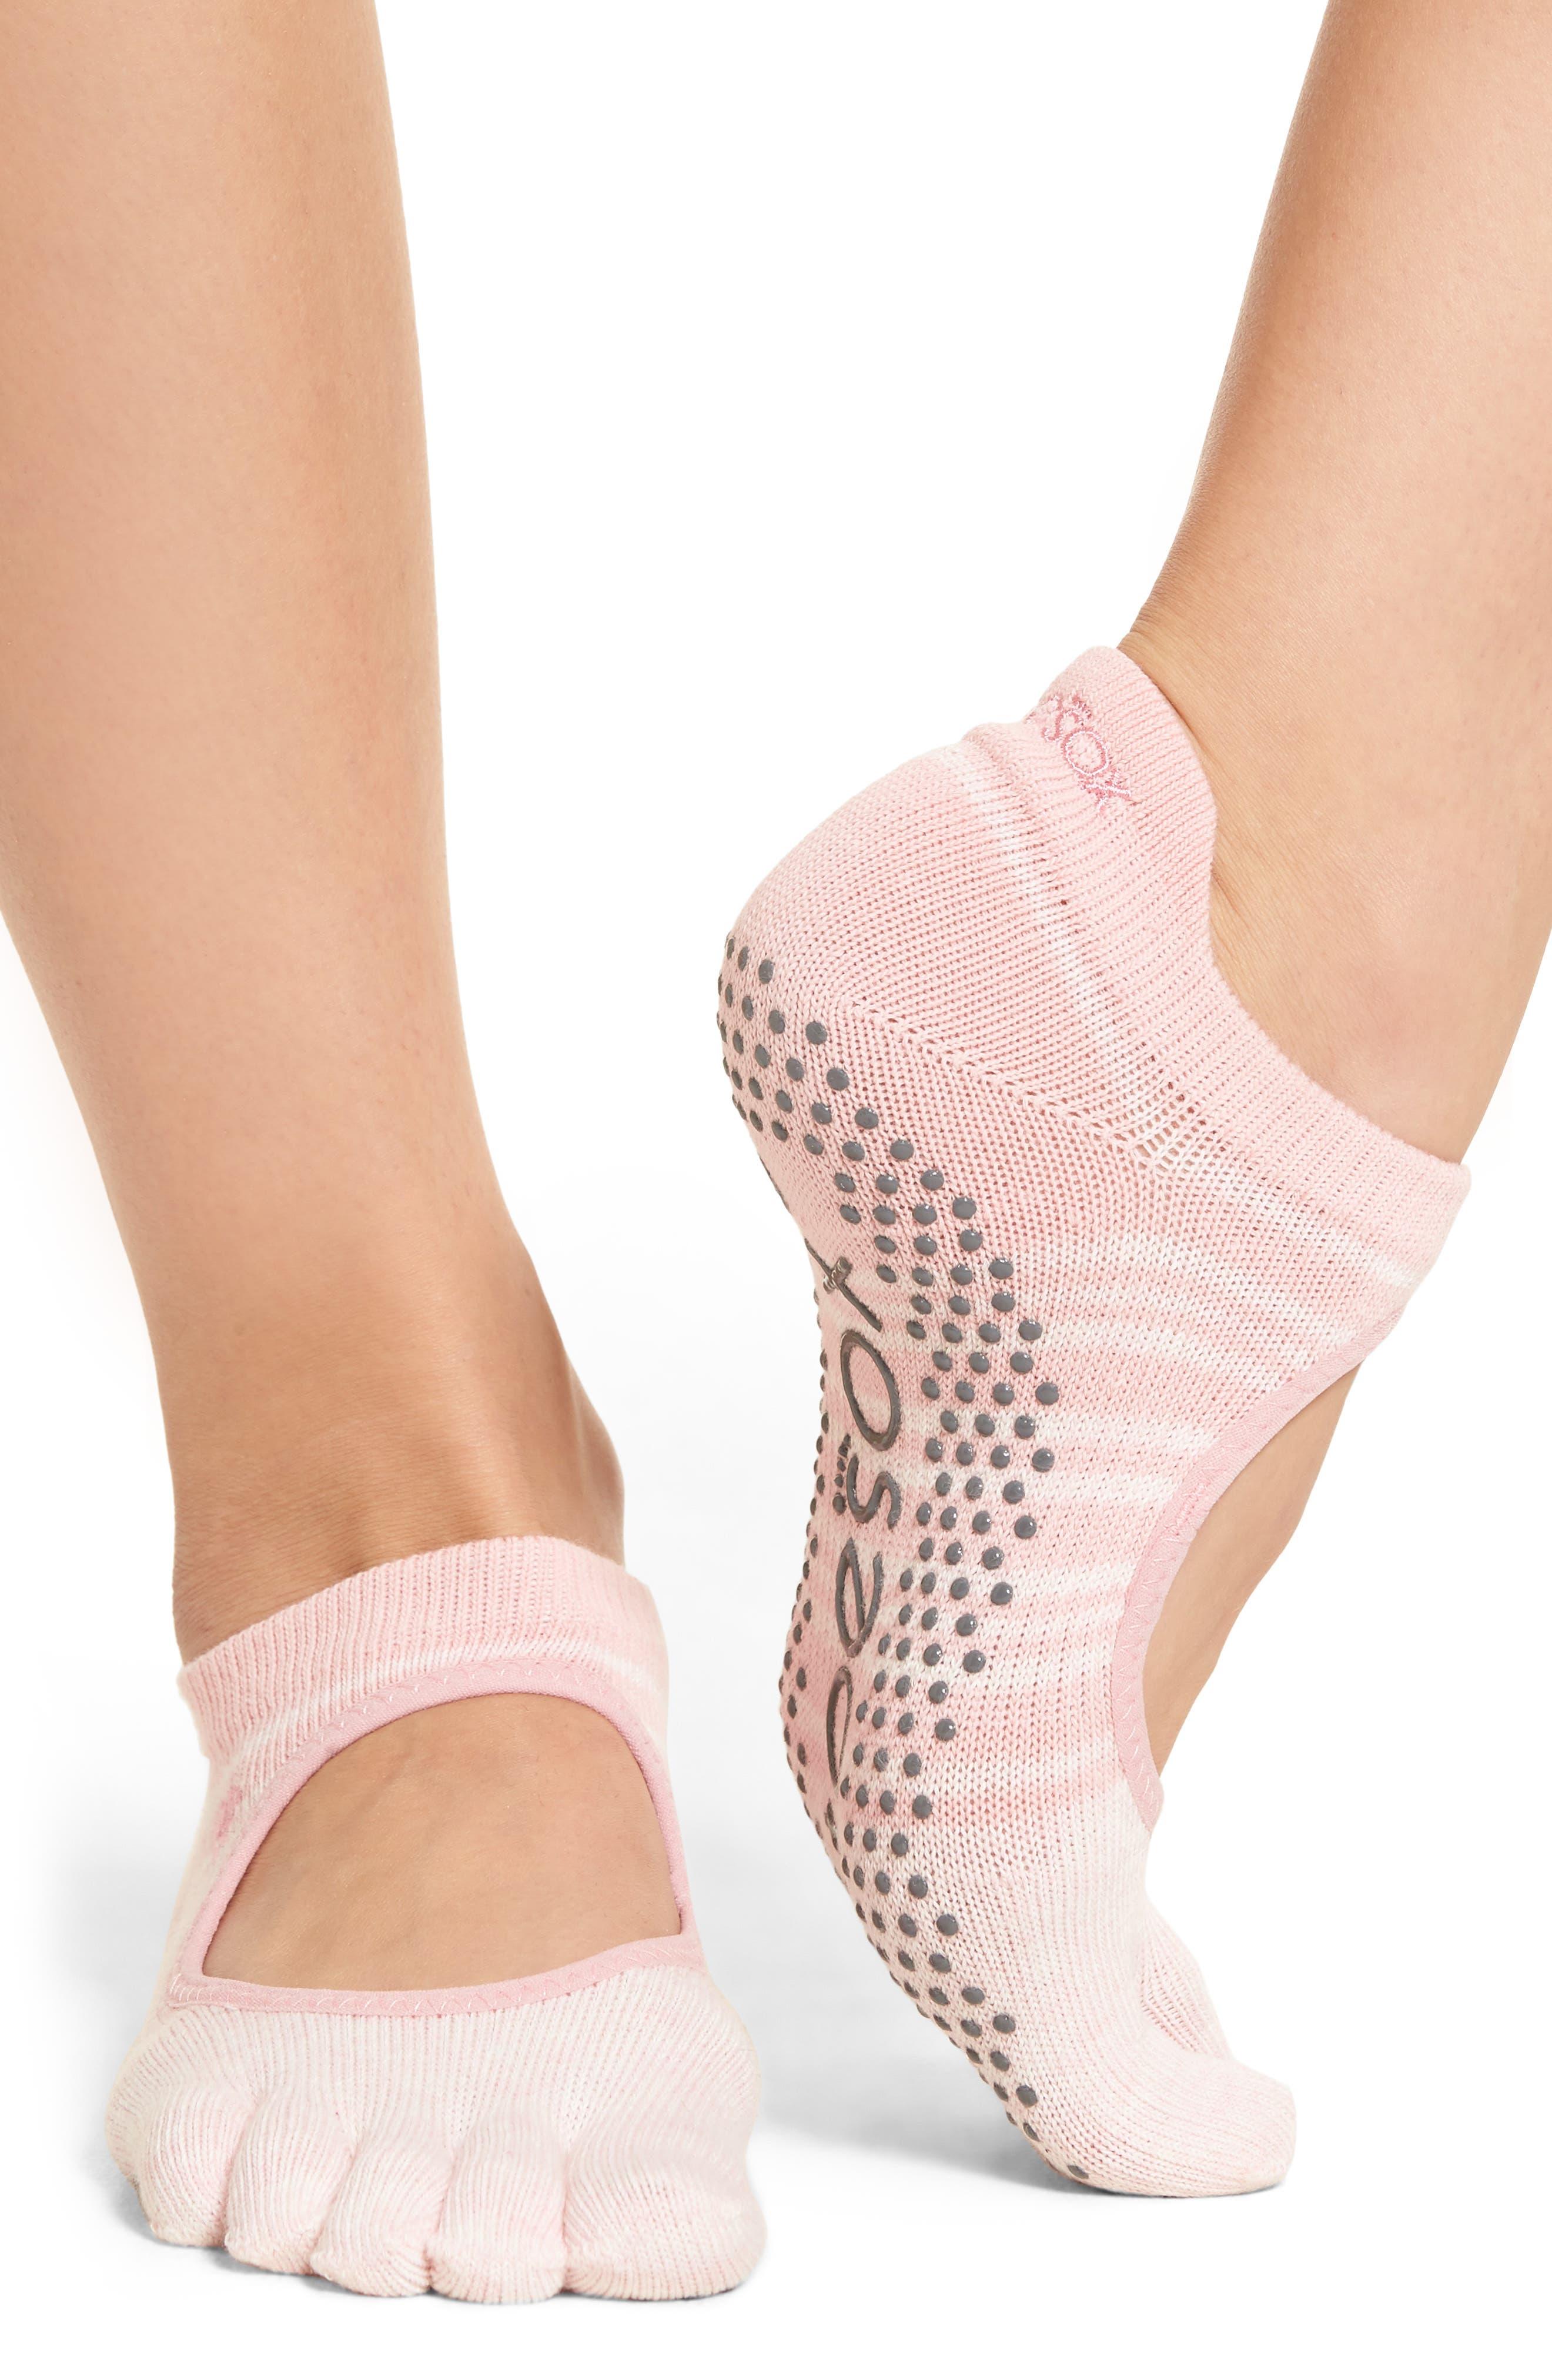 Bellarina Full Toe Gripper Socks,                             Alternate thumbnail 2, color,                             Smitten